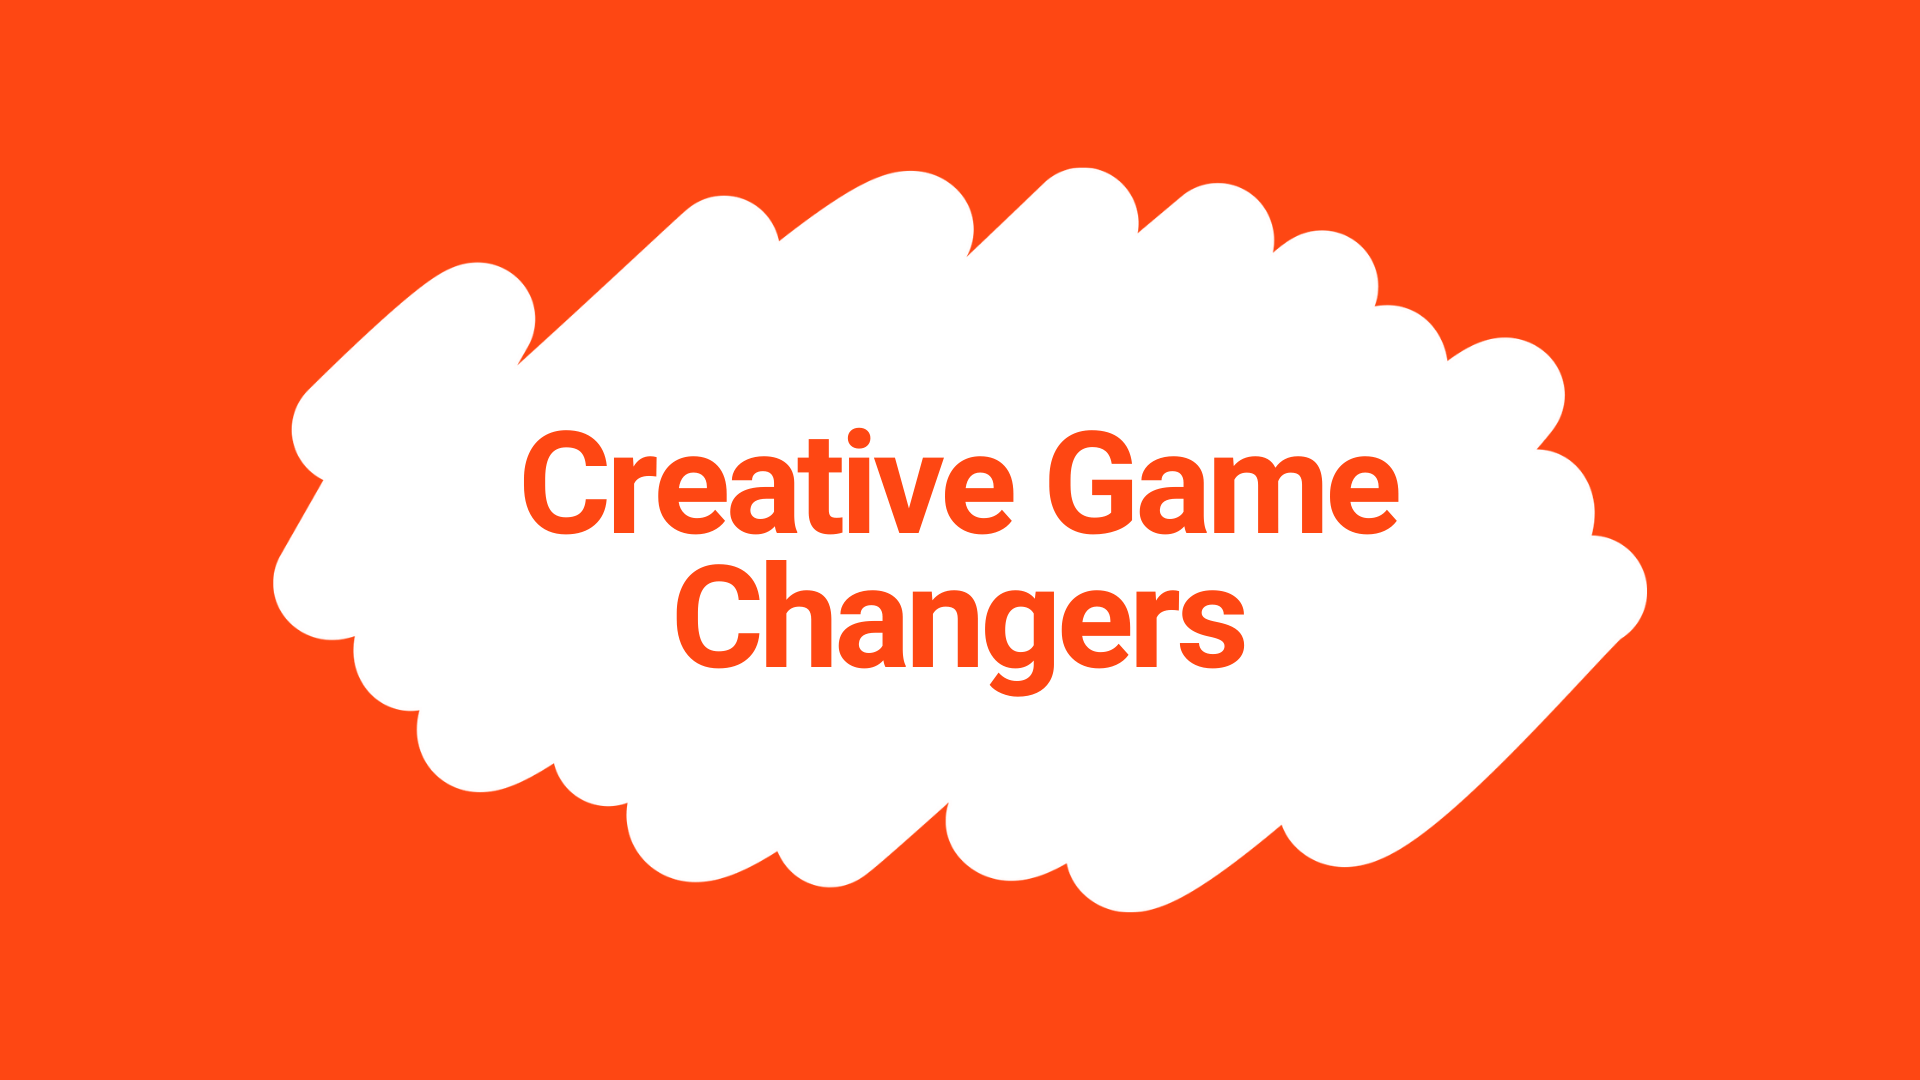 Creative Game Changers logo